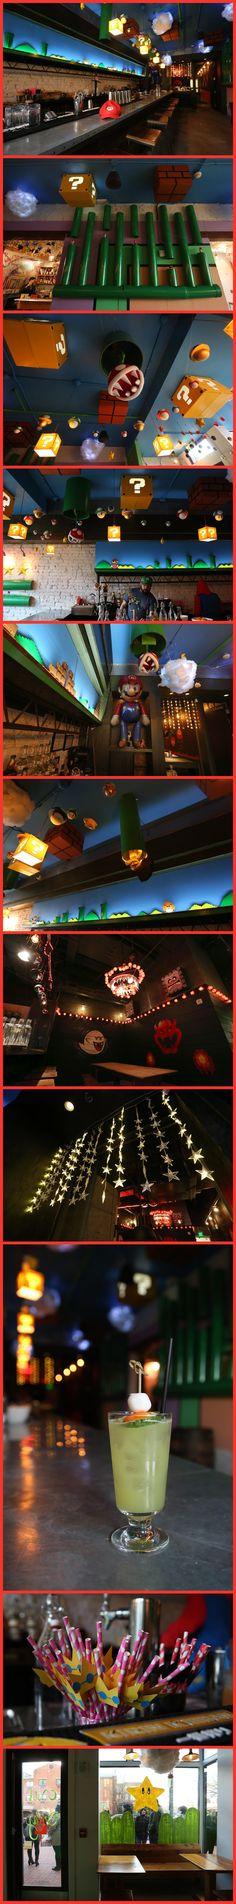 This is fuckin dope Super Mario Bros themed Pop Up Bar in Washington DC. Classic Nintendo NES Video Game decor and drinks. Nerd Room, Gamer Room, Video Game Decor, Video Games, Deco Gamer, Pop Up Bar, Retro Arcade, Mario Party, Super Mario Bros